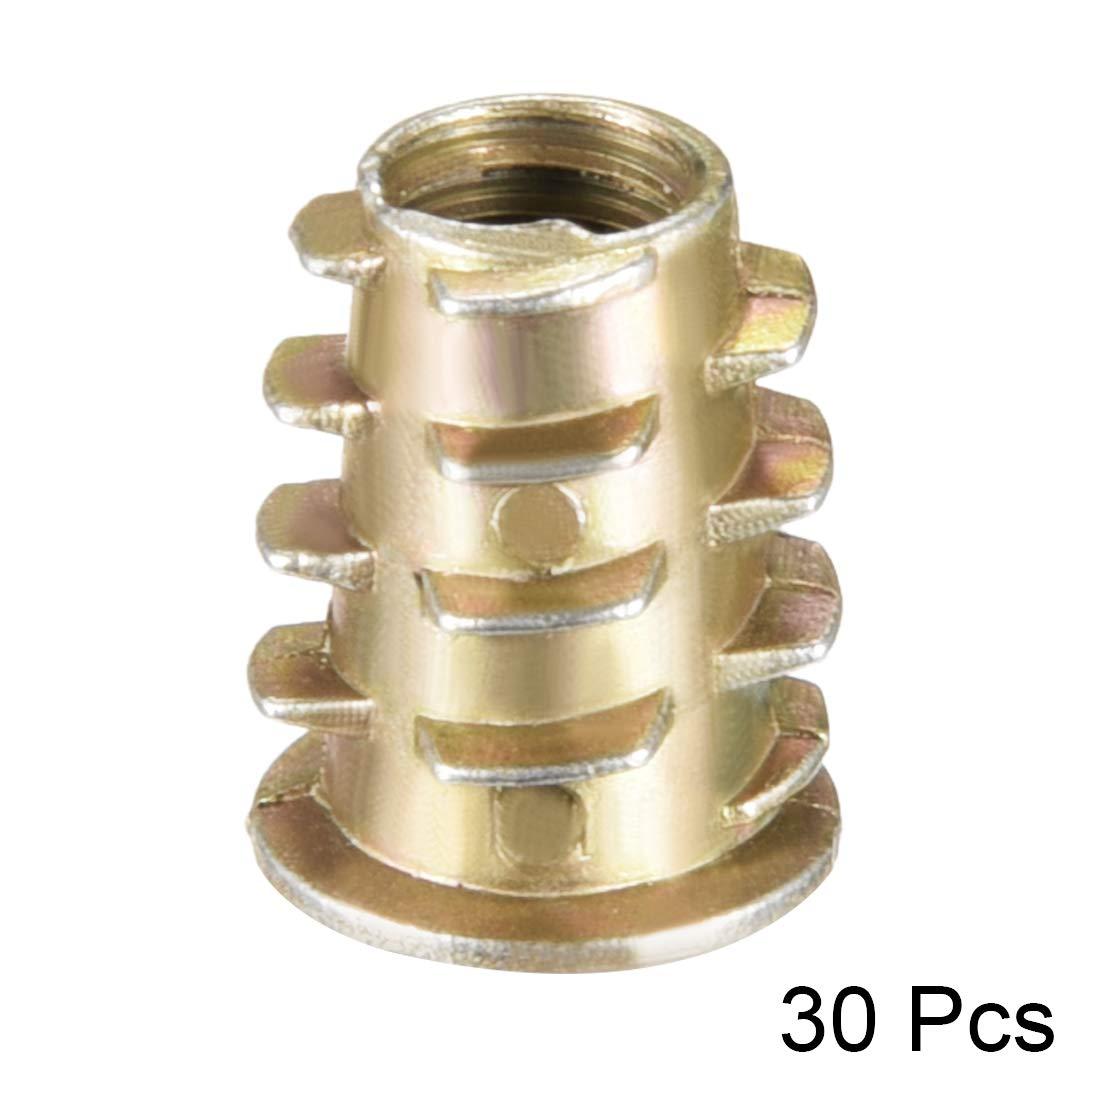 uxcell Threaded Insert Nuts Zinc Alloy Hex Socket M6 Internal Threads 14mm Length 50pcs